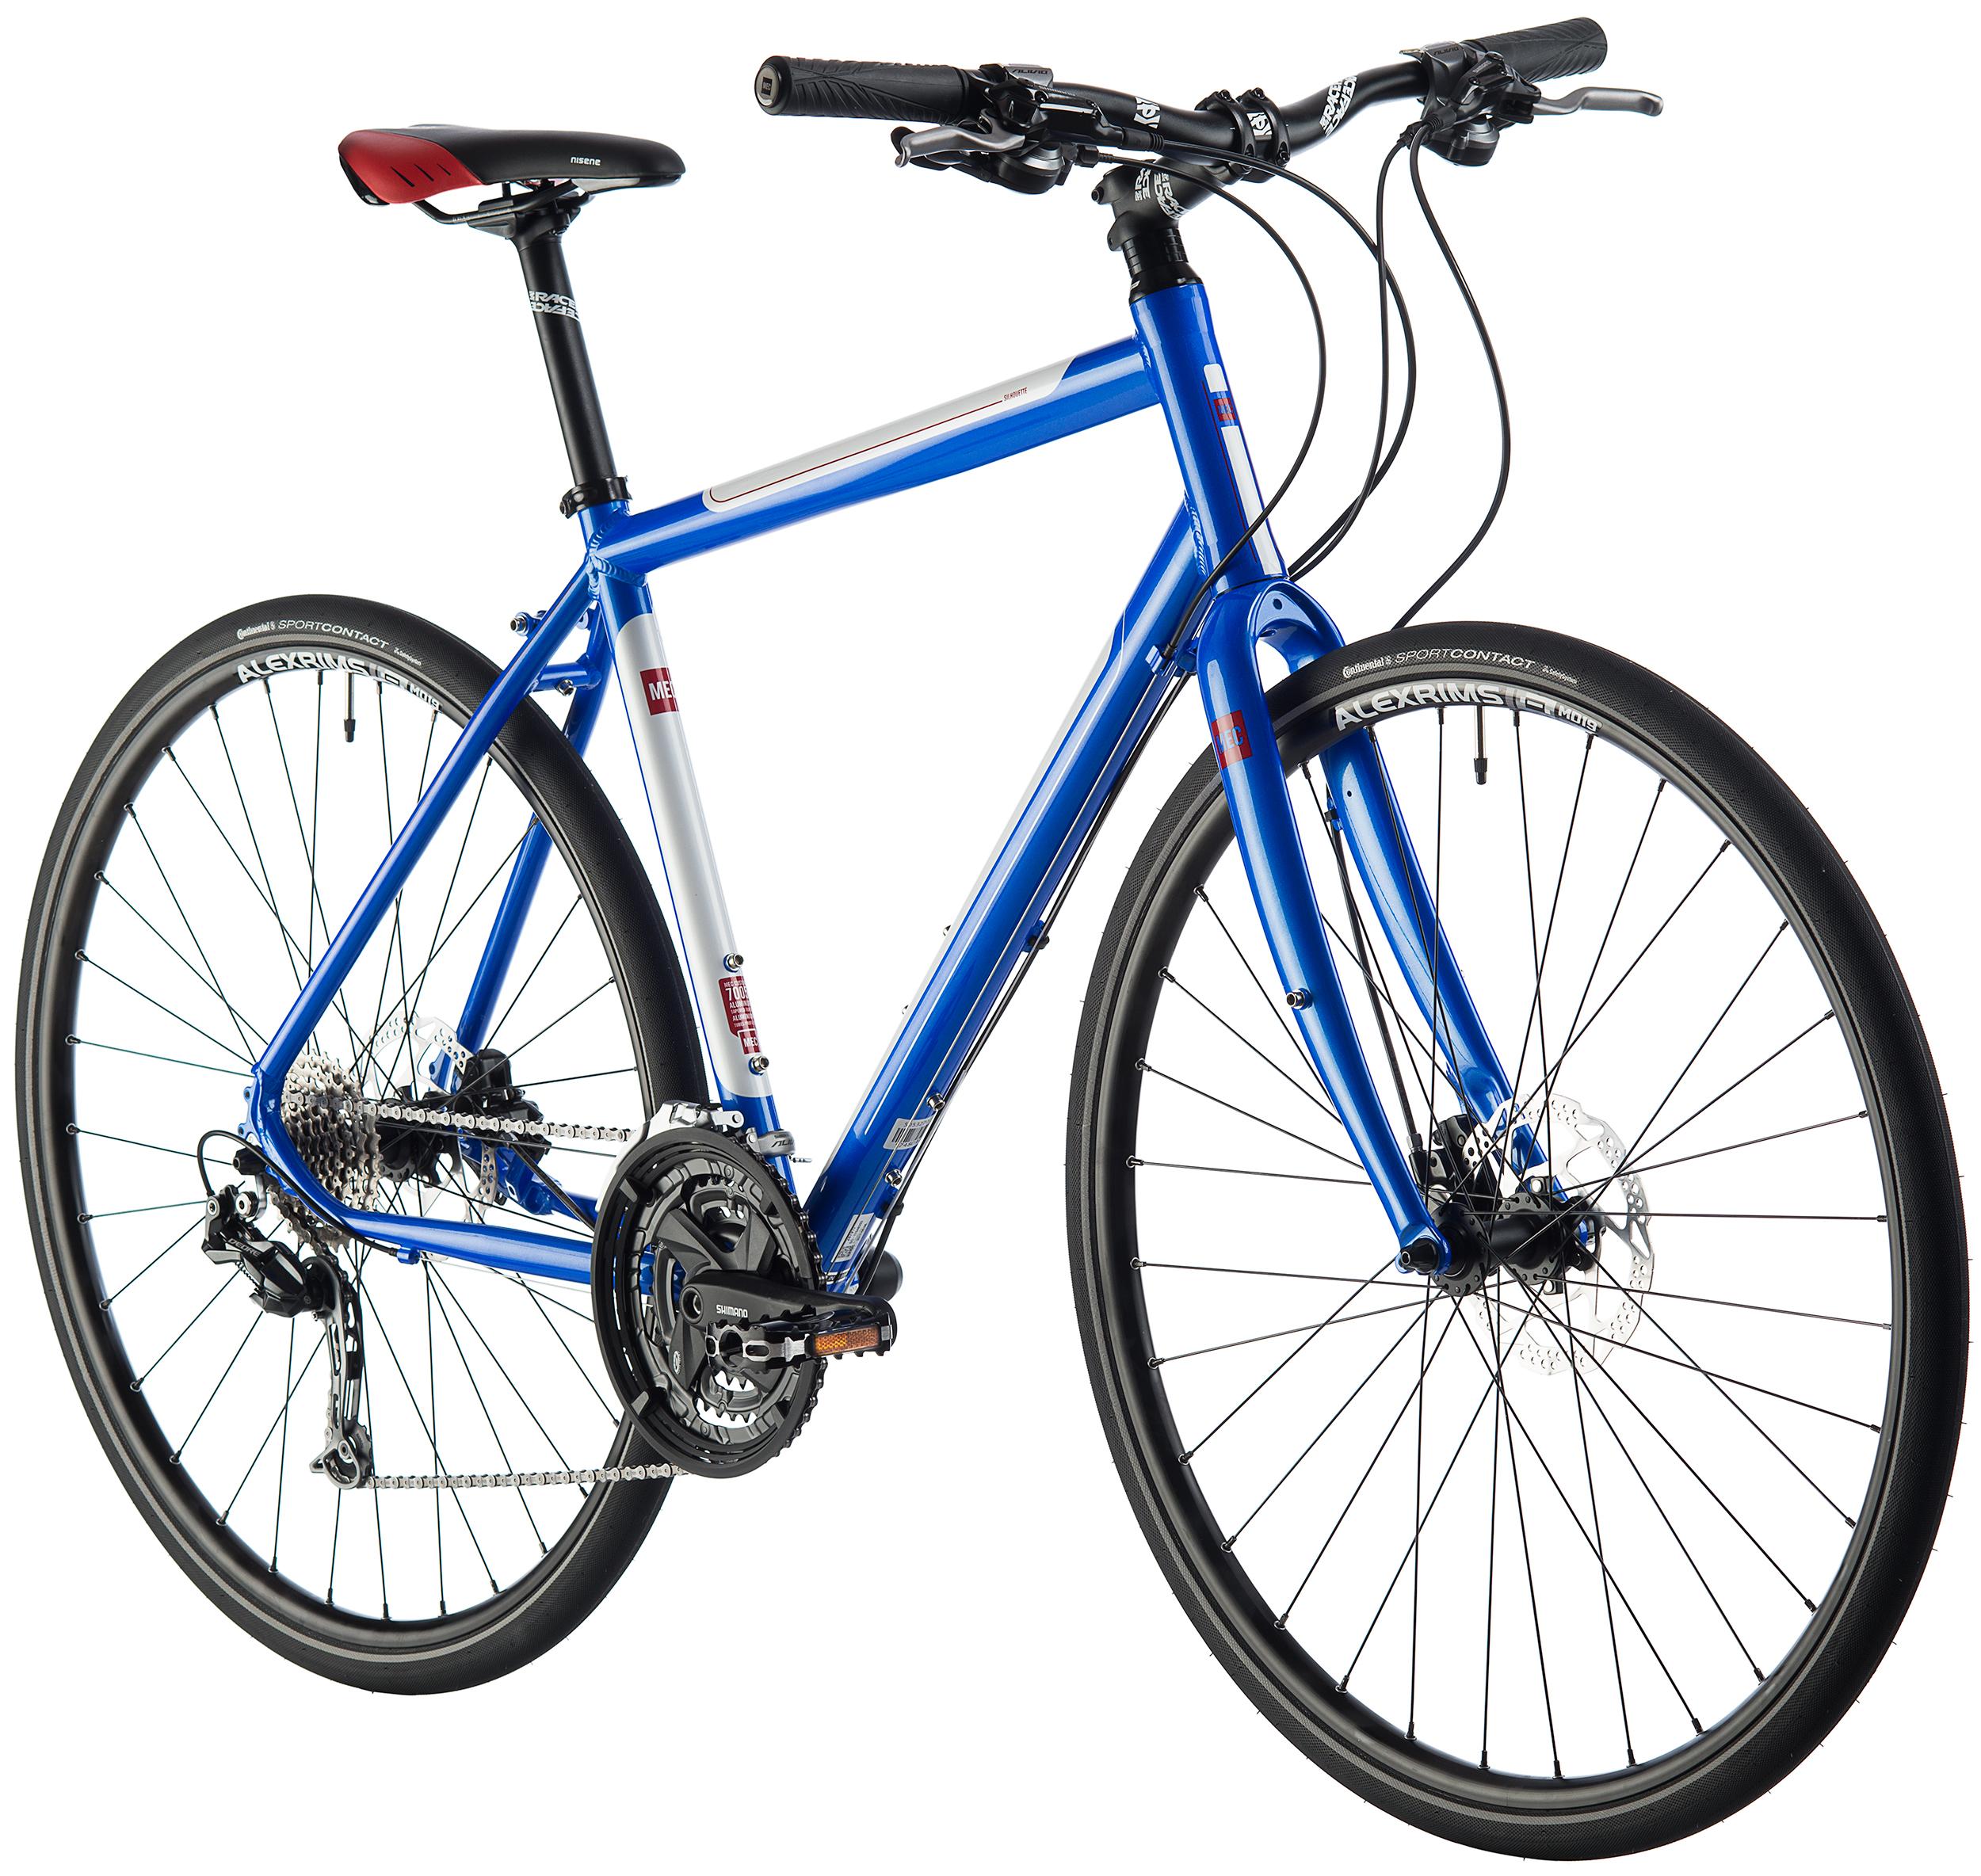 Mec Silhouette Bicycle Unisex Crank Shimano Alivio Touring 26 36 48 T